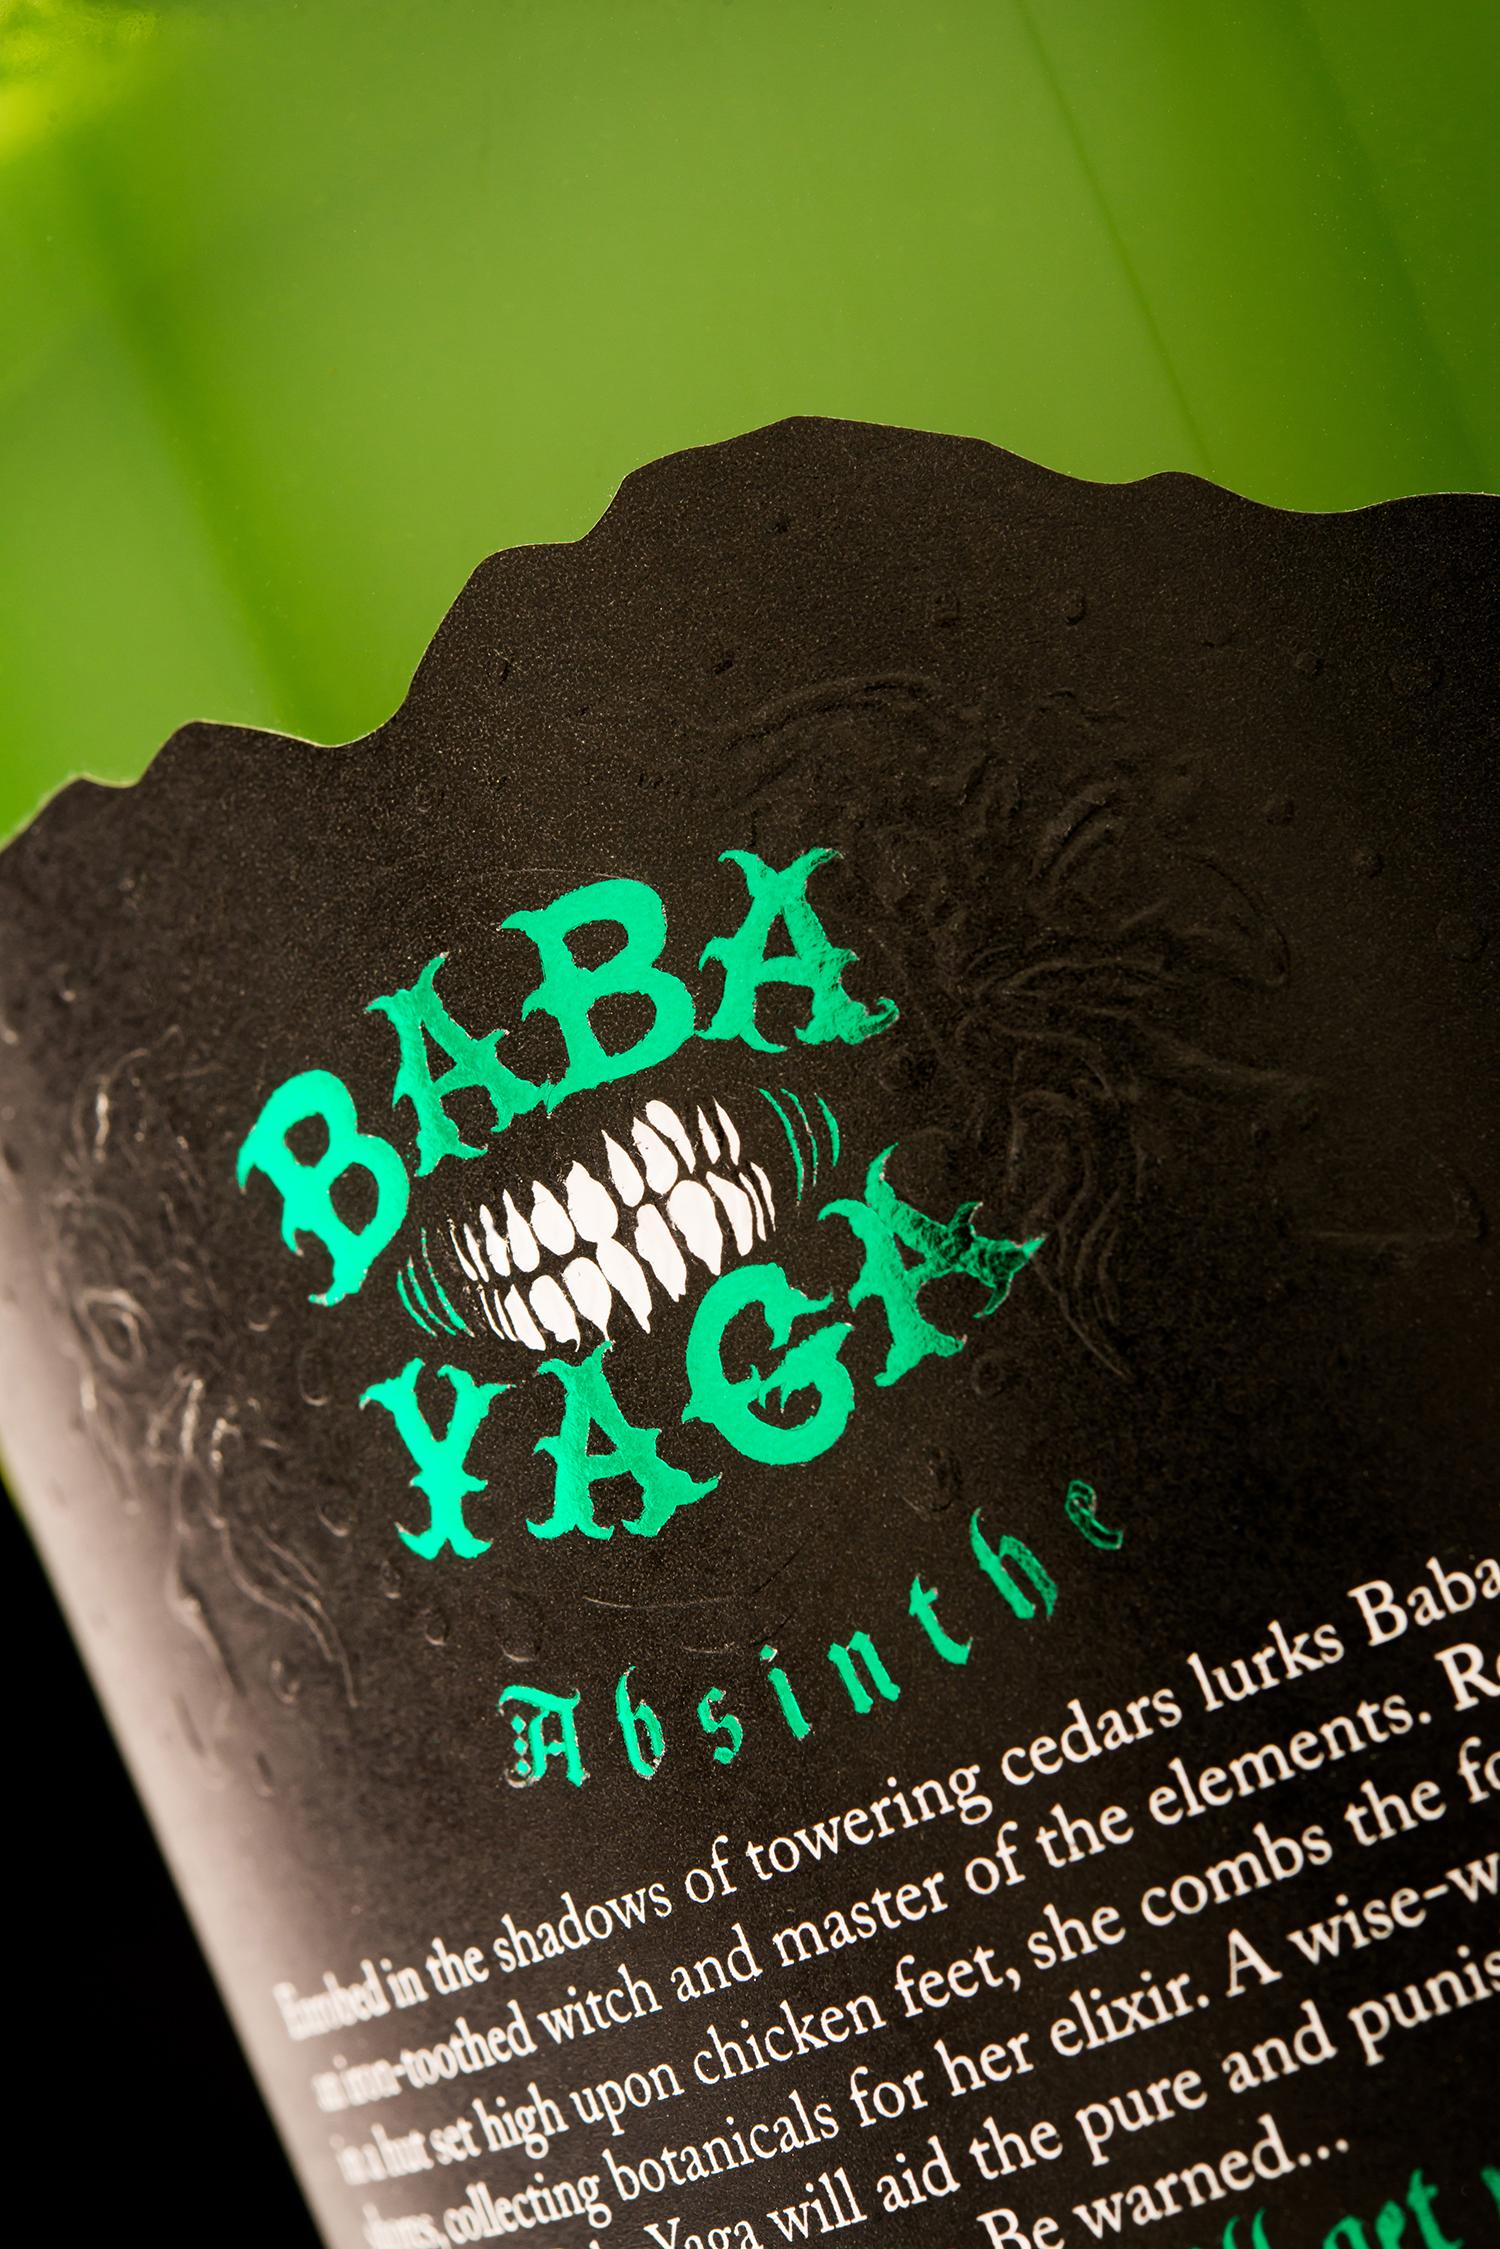 Packaging Design for Arbutus Distillery's Baba Yaga Absinthe